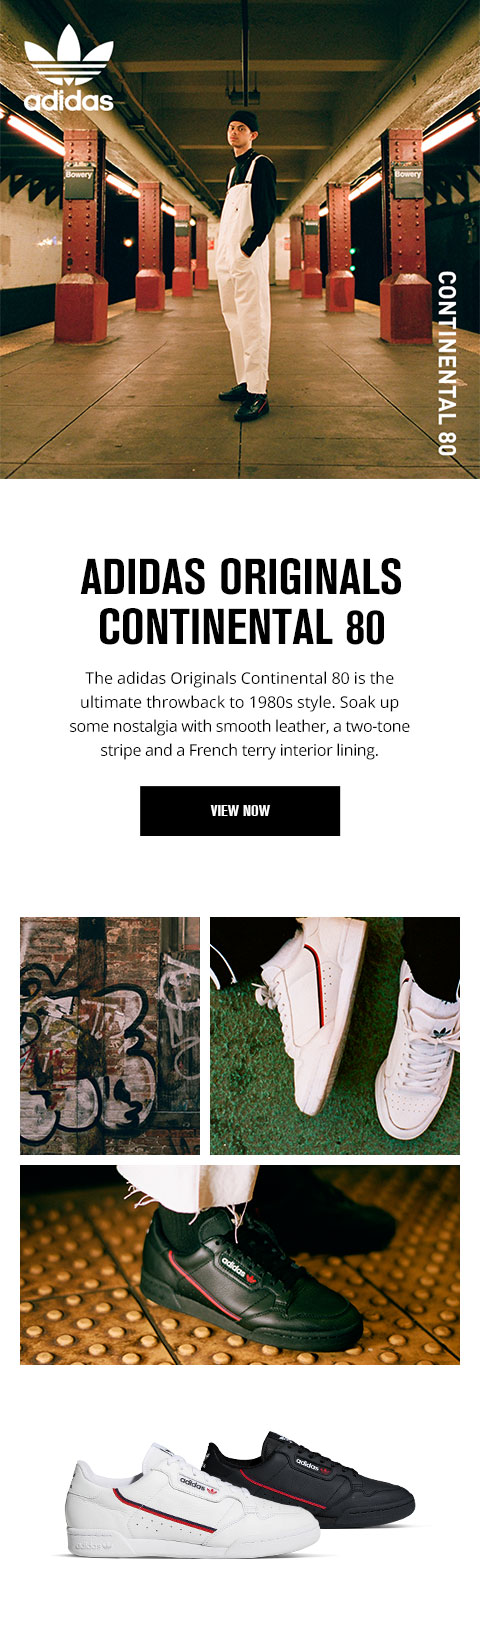 foot locker: avvio domani adidas originali continental 80